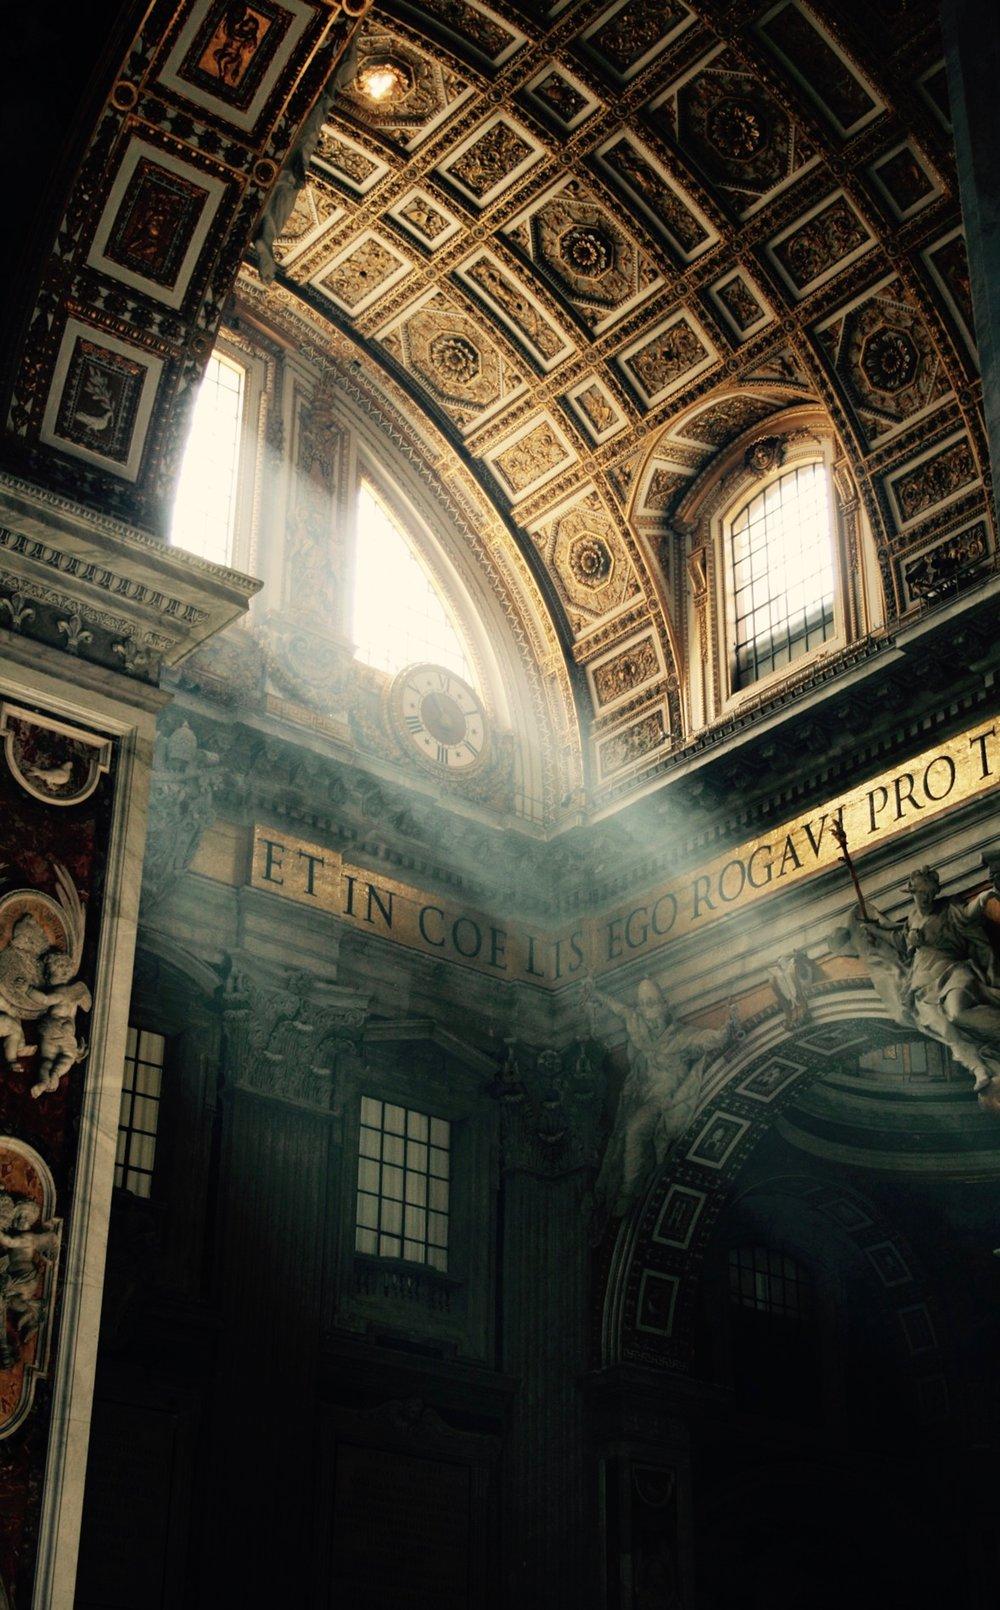 Sollys Vaticanet.jpg